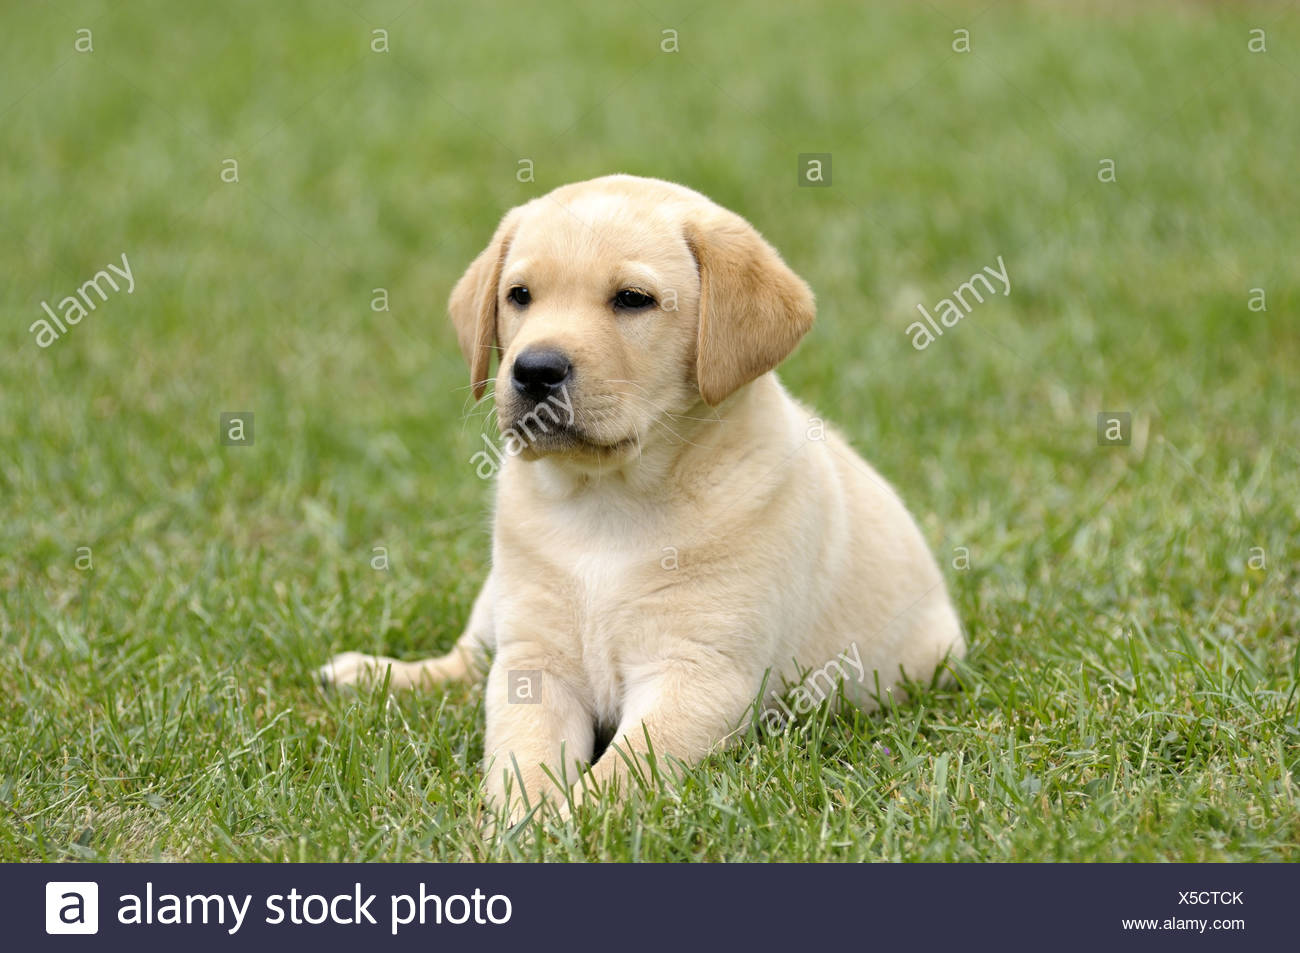 Blonde Labrador Retriever Lying On The Grass Puppy Stock Photo Alamy